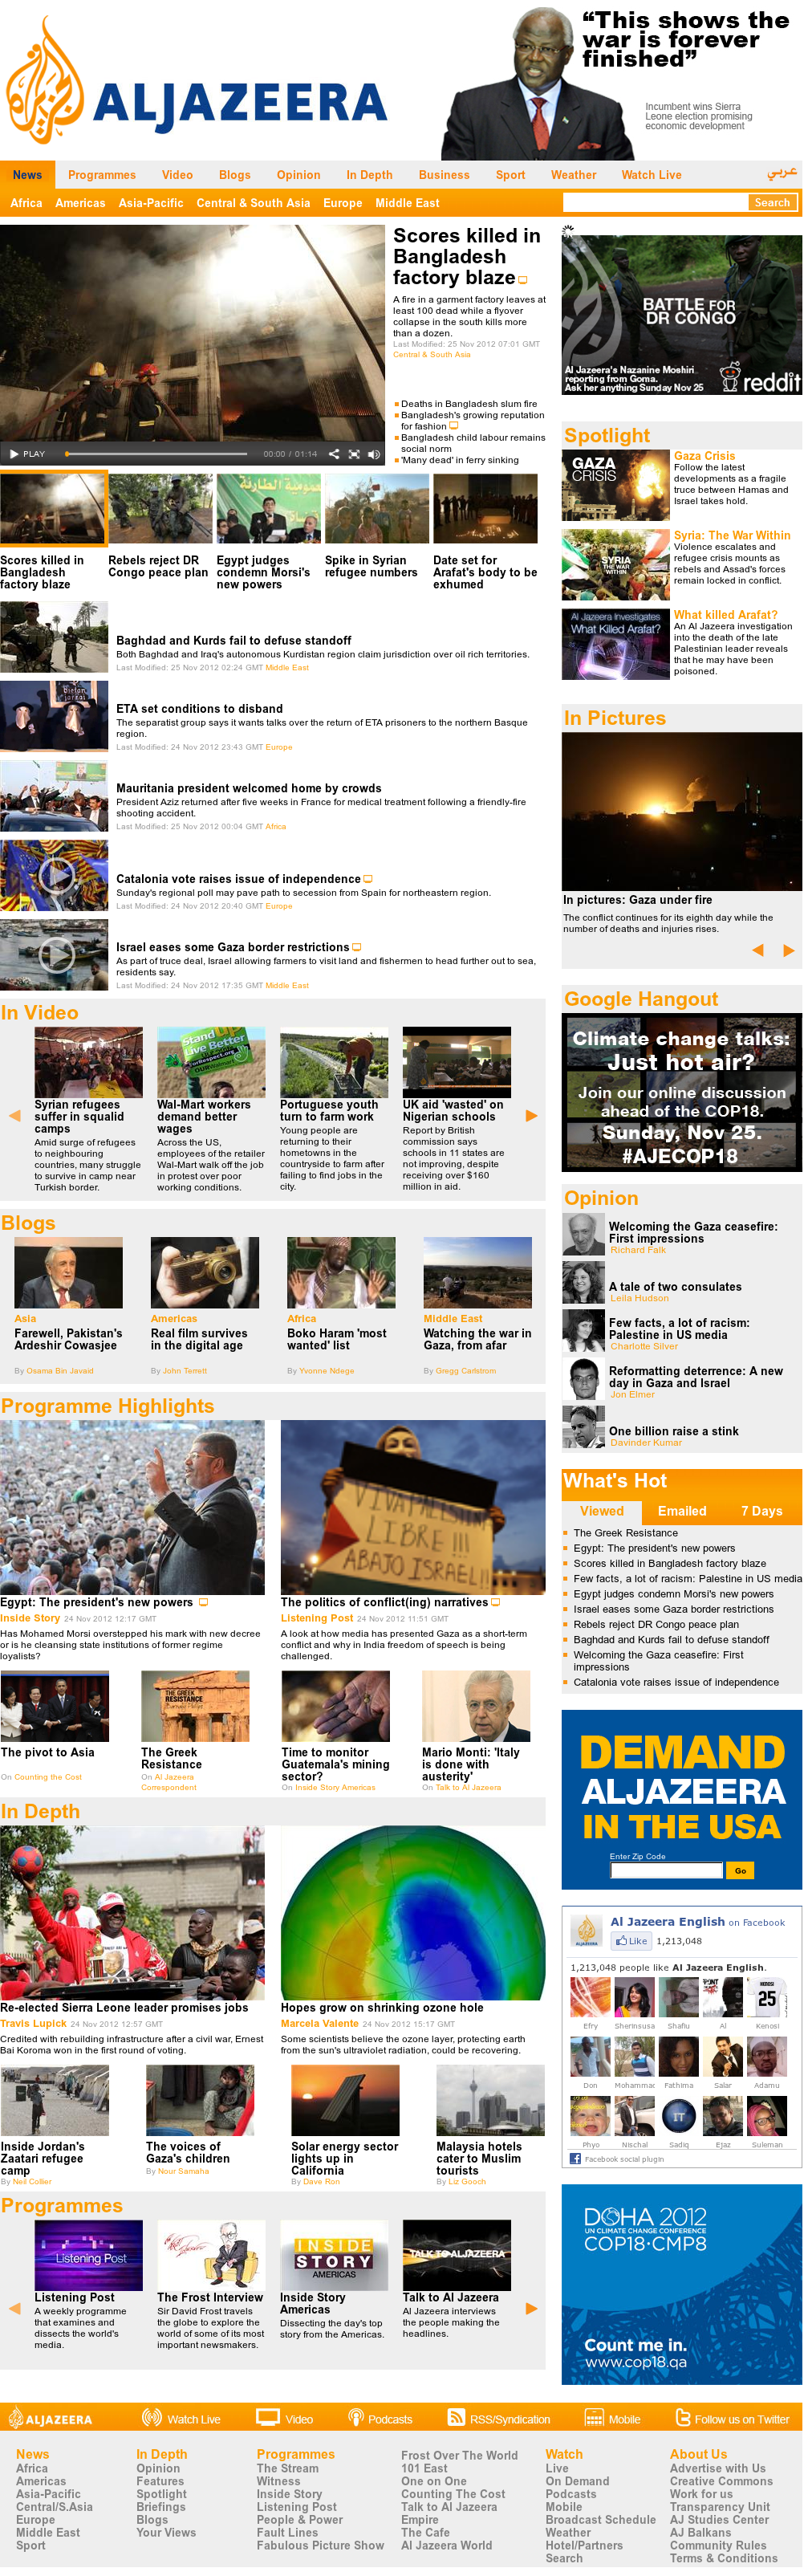 Al Jazeera (English) at Sunday Nov. 25, 2012, 7:16 a.m. UTC